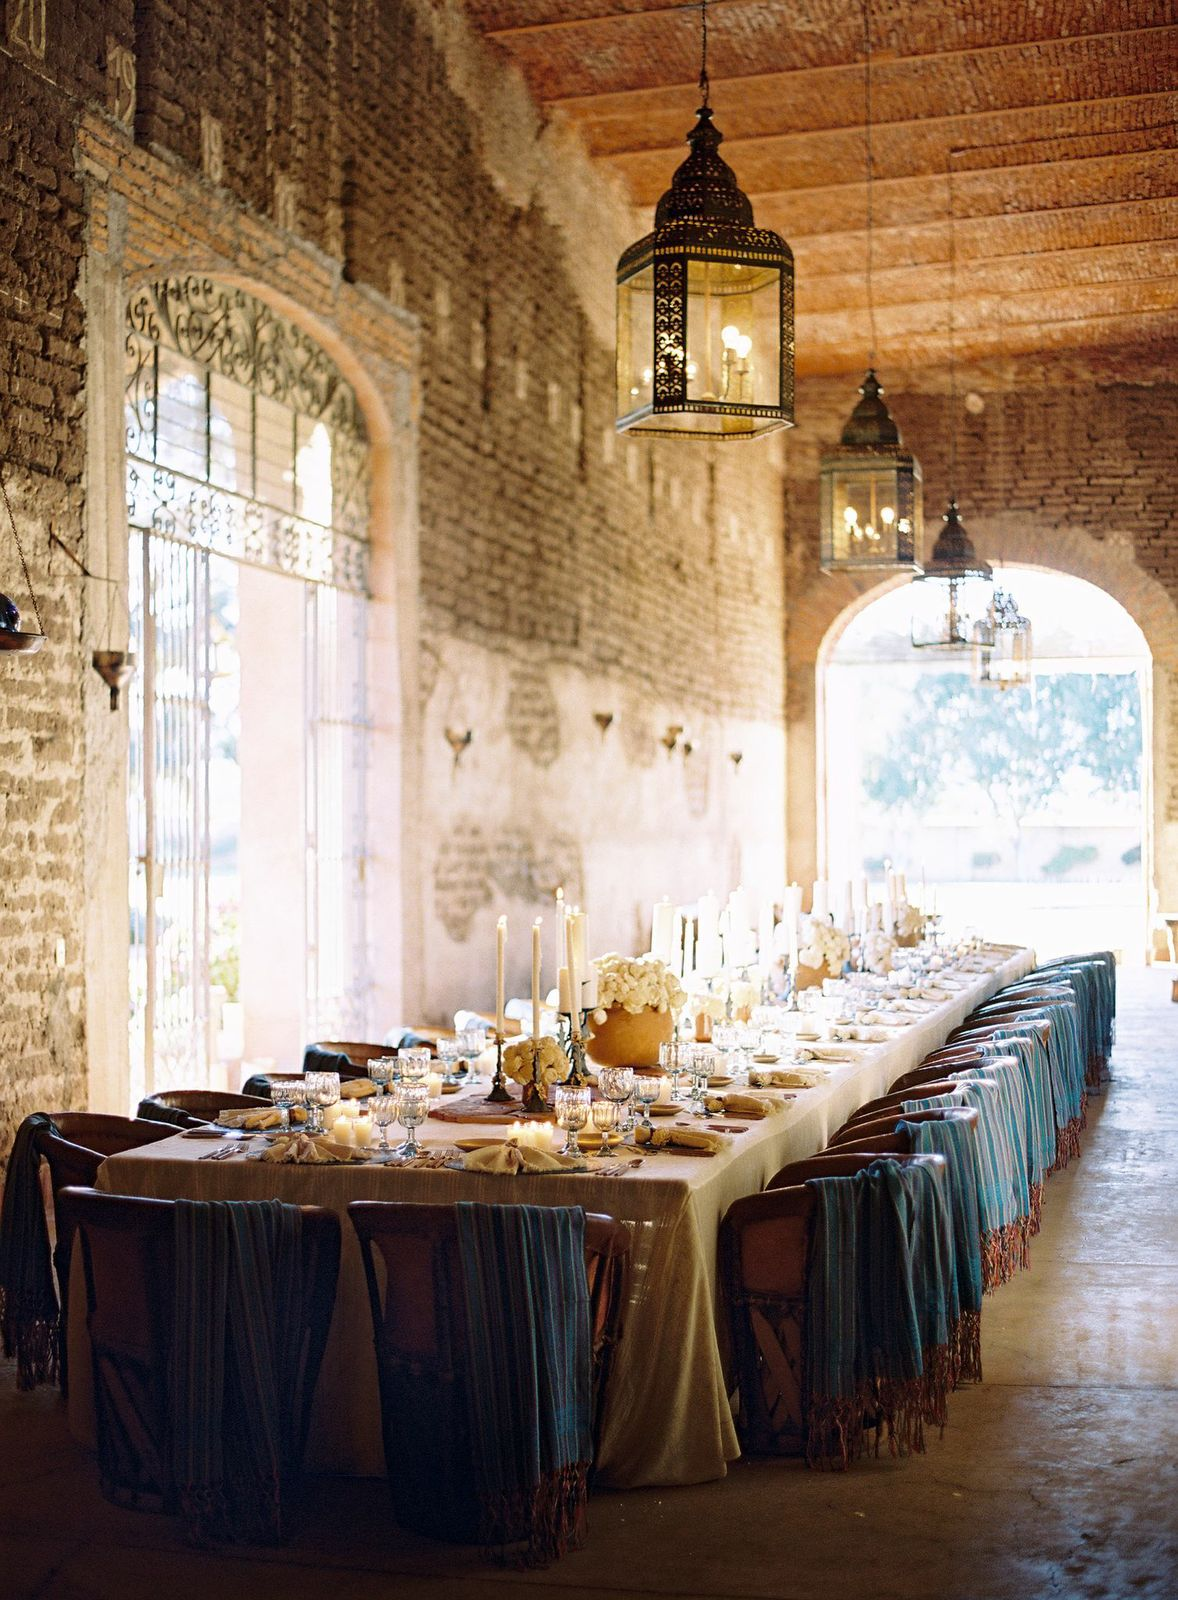 Dinner was held in the hacienda's, now abandoned, sugarcane storage room.